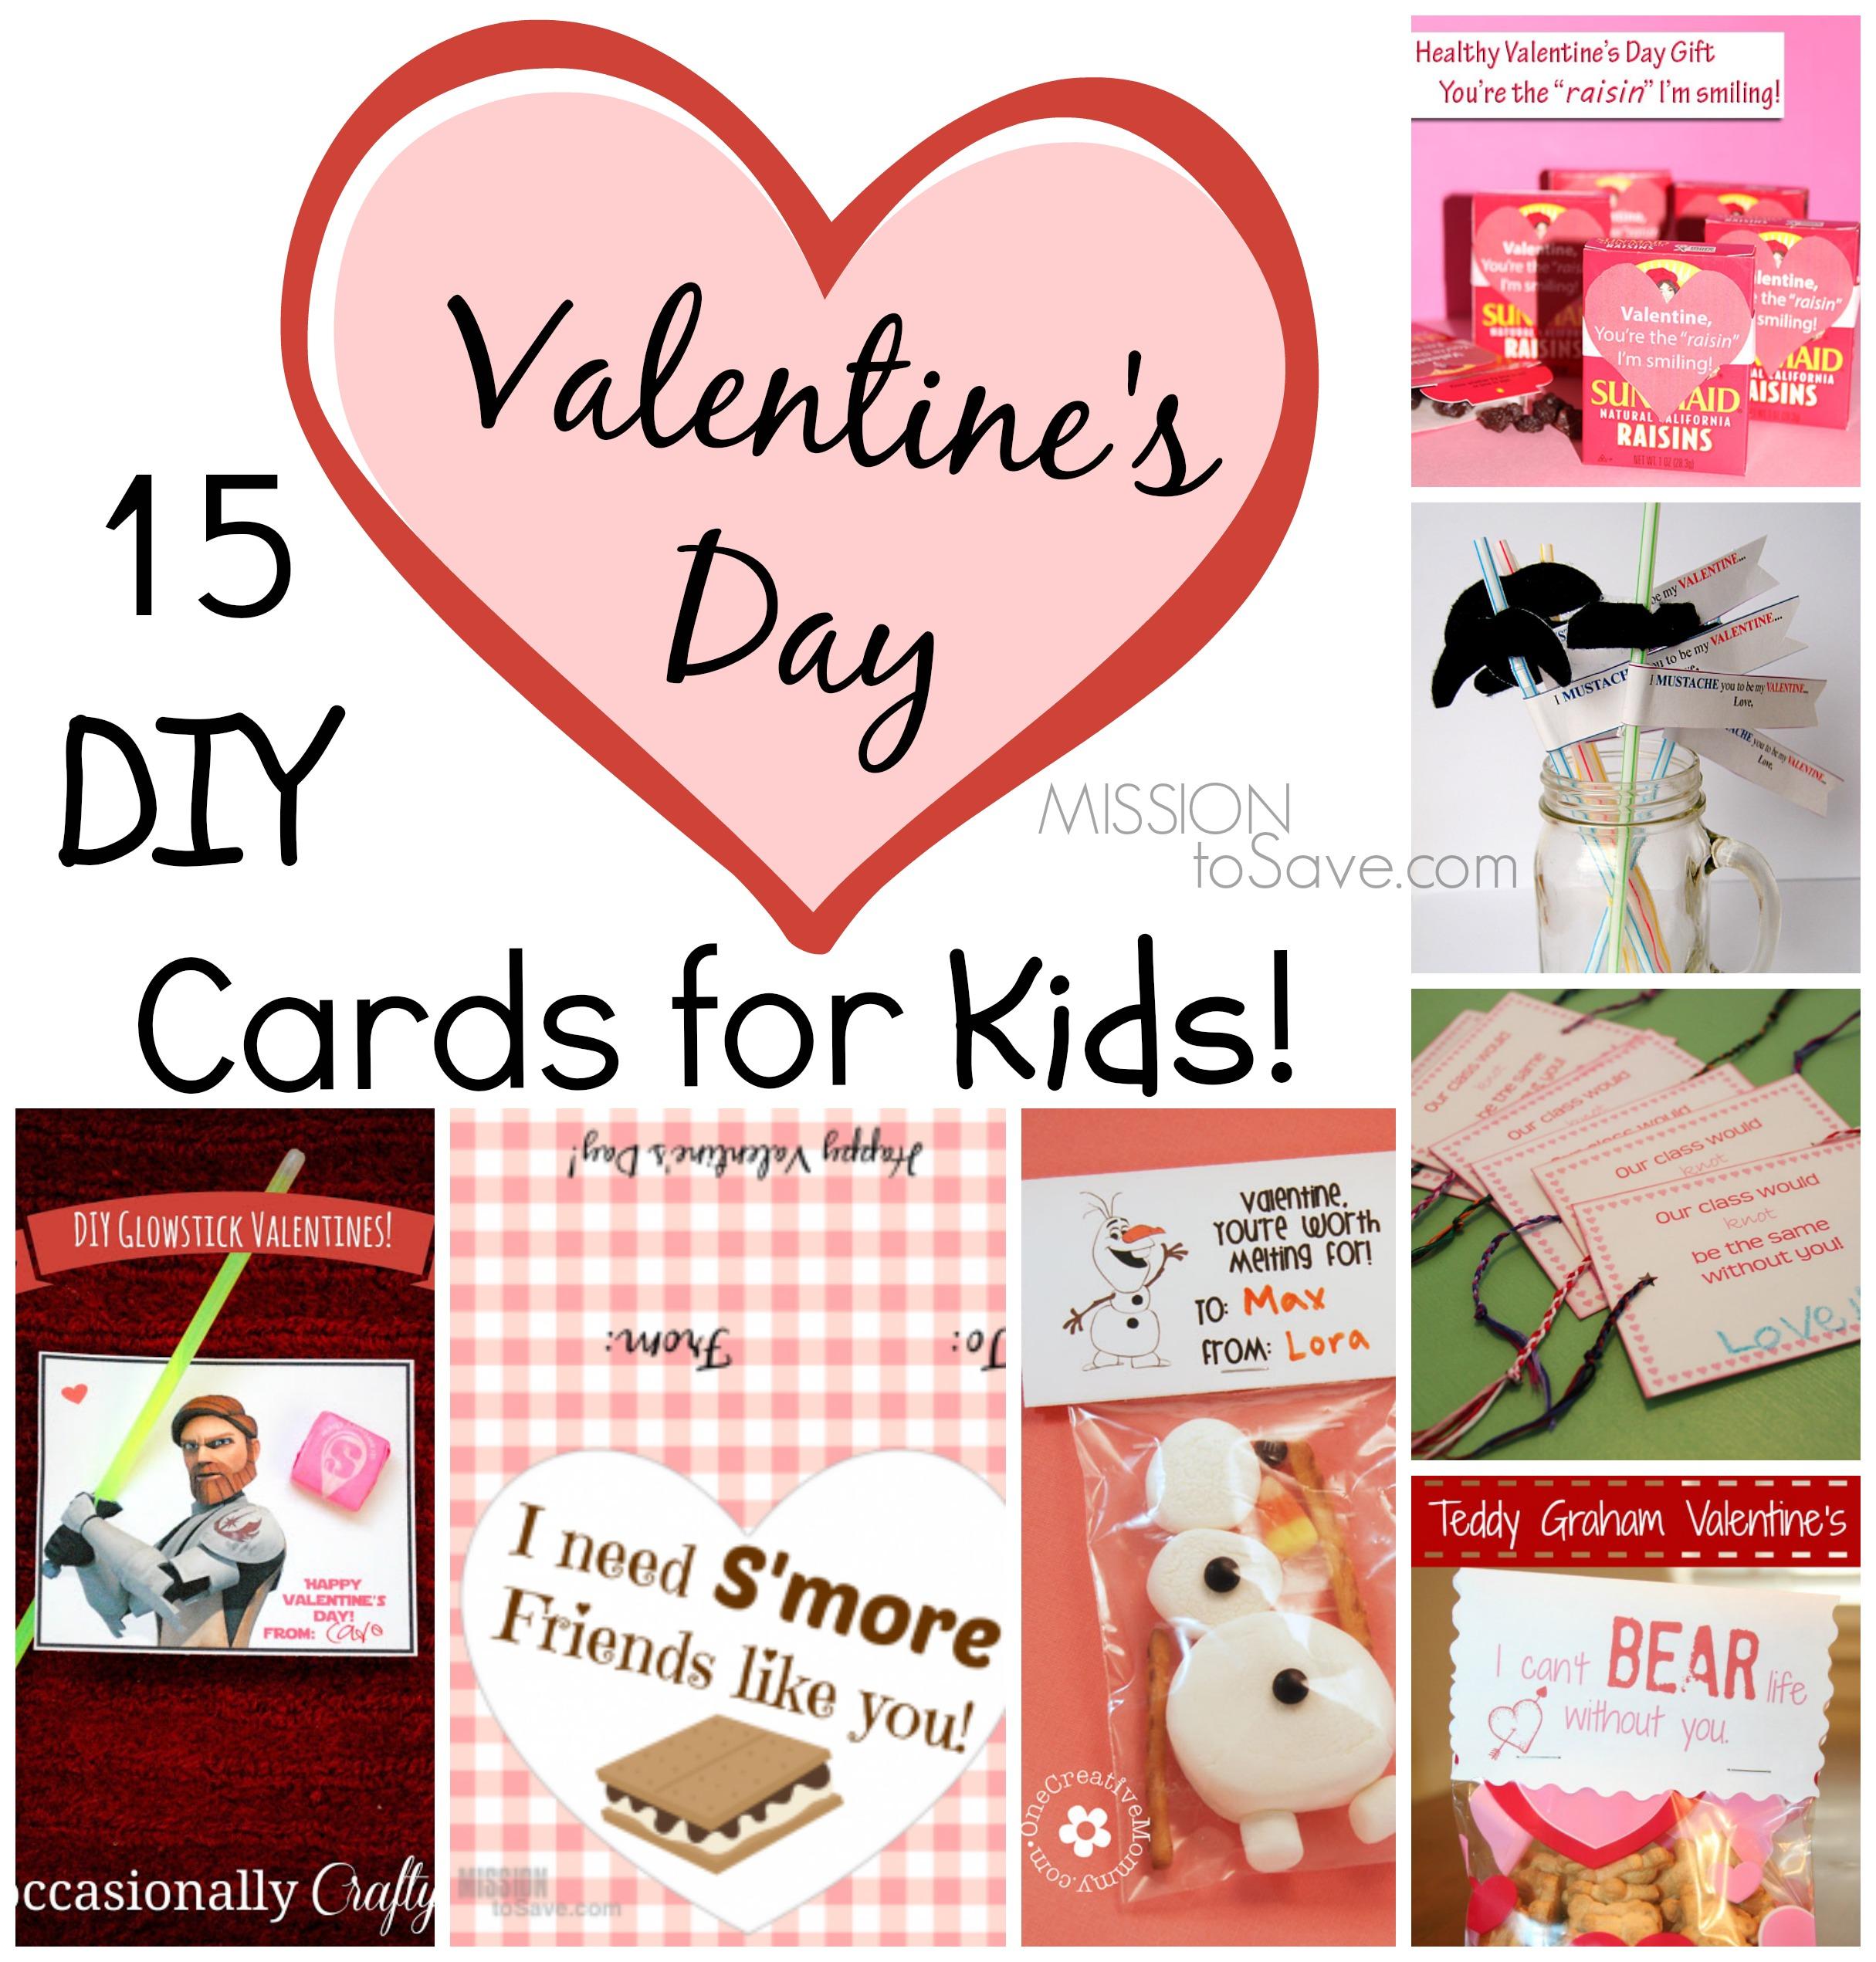 Fancy Diy Valentine Day Cards Kids To Make Valentine S Day Cards Kids Printable Kids To Save Valentine S Day Cards cards Valentines Day Cards For Kids